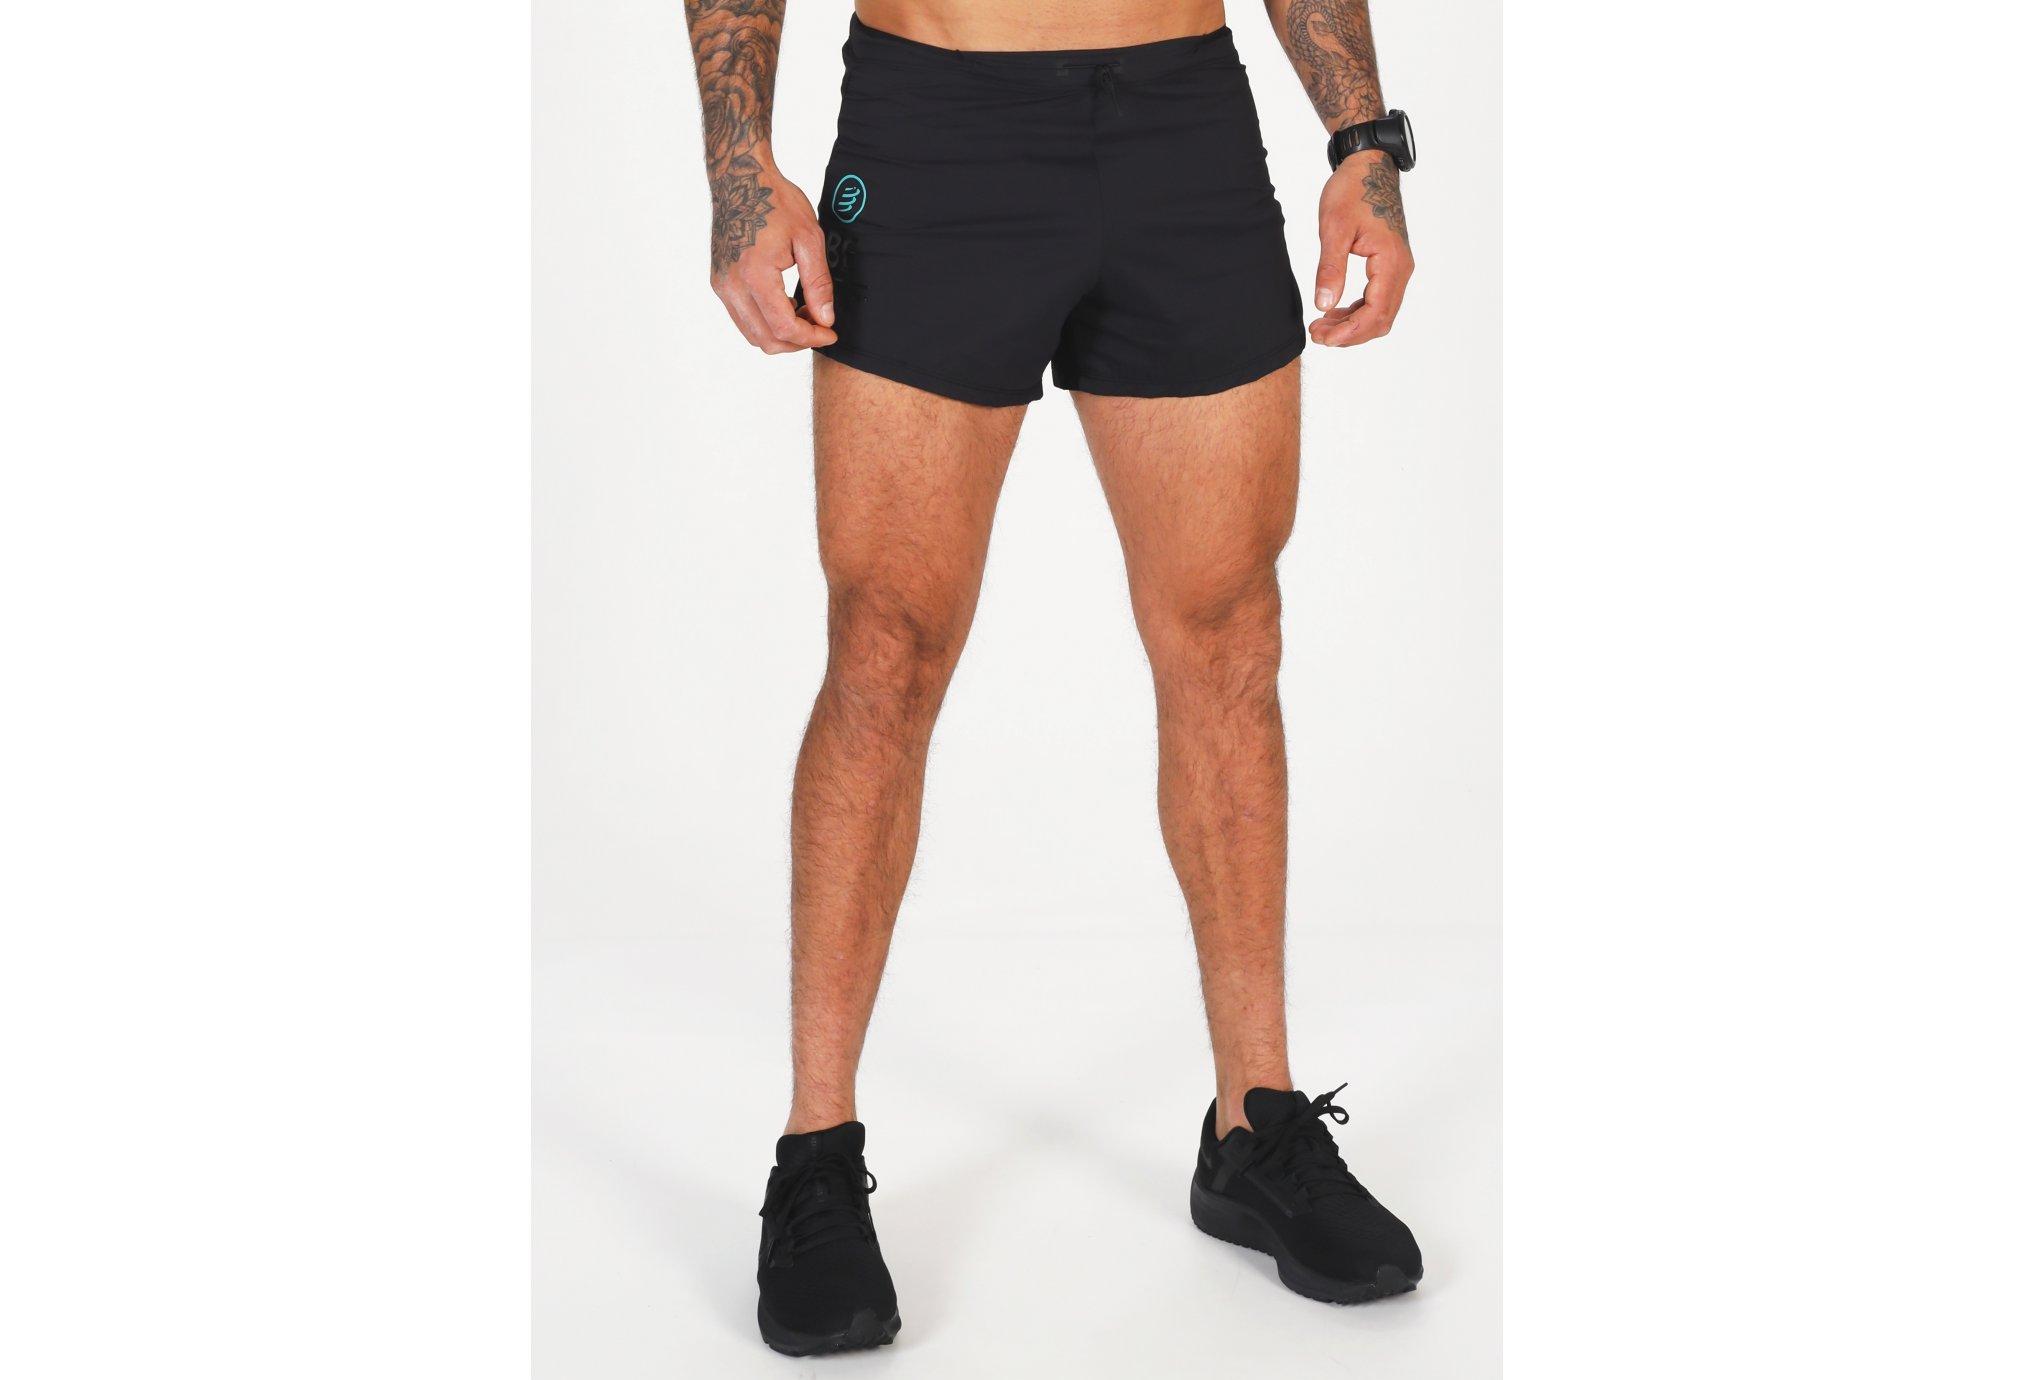 Compressport Racing Split Overshort Black Edition 2021 M vêtement running homme